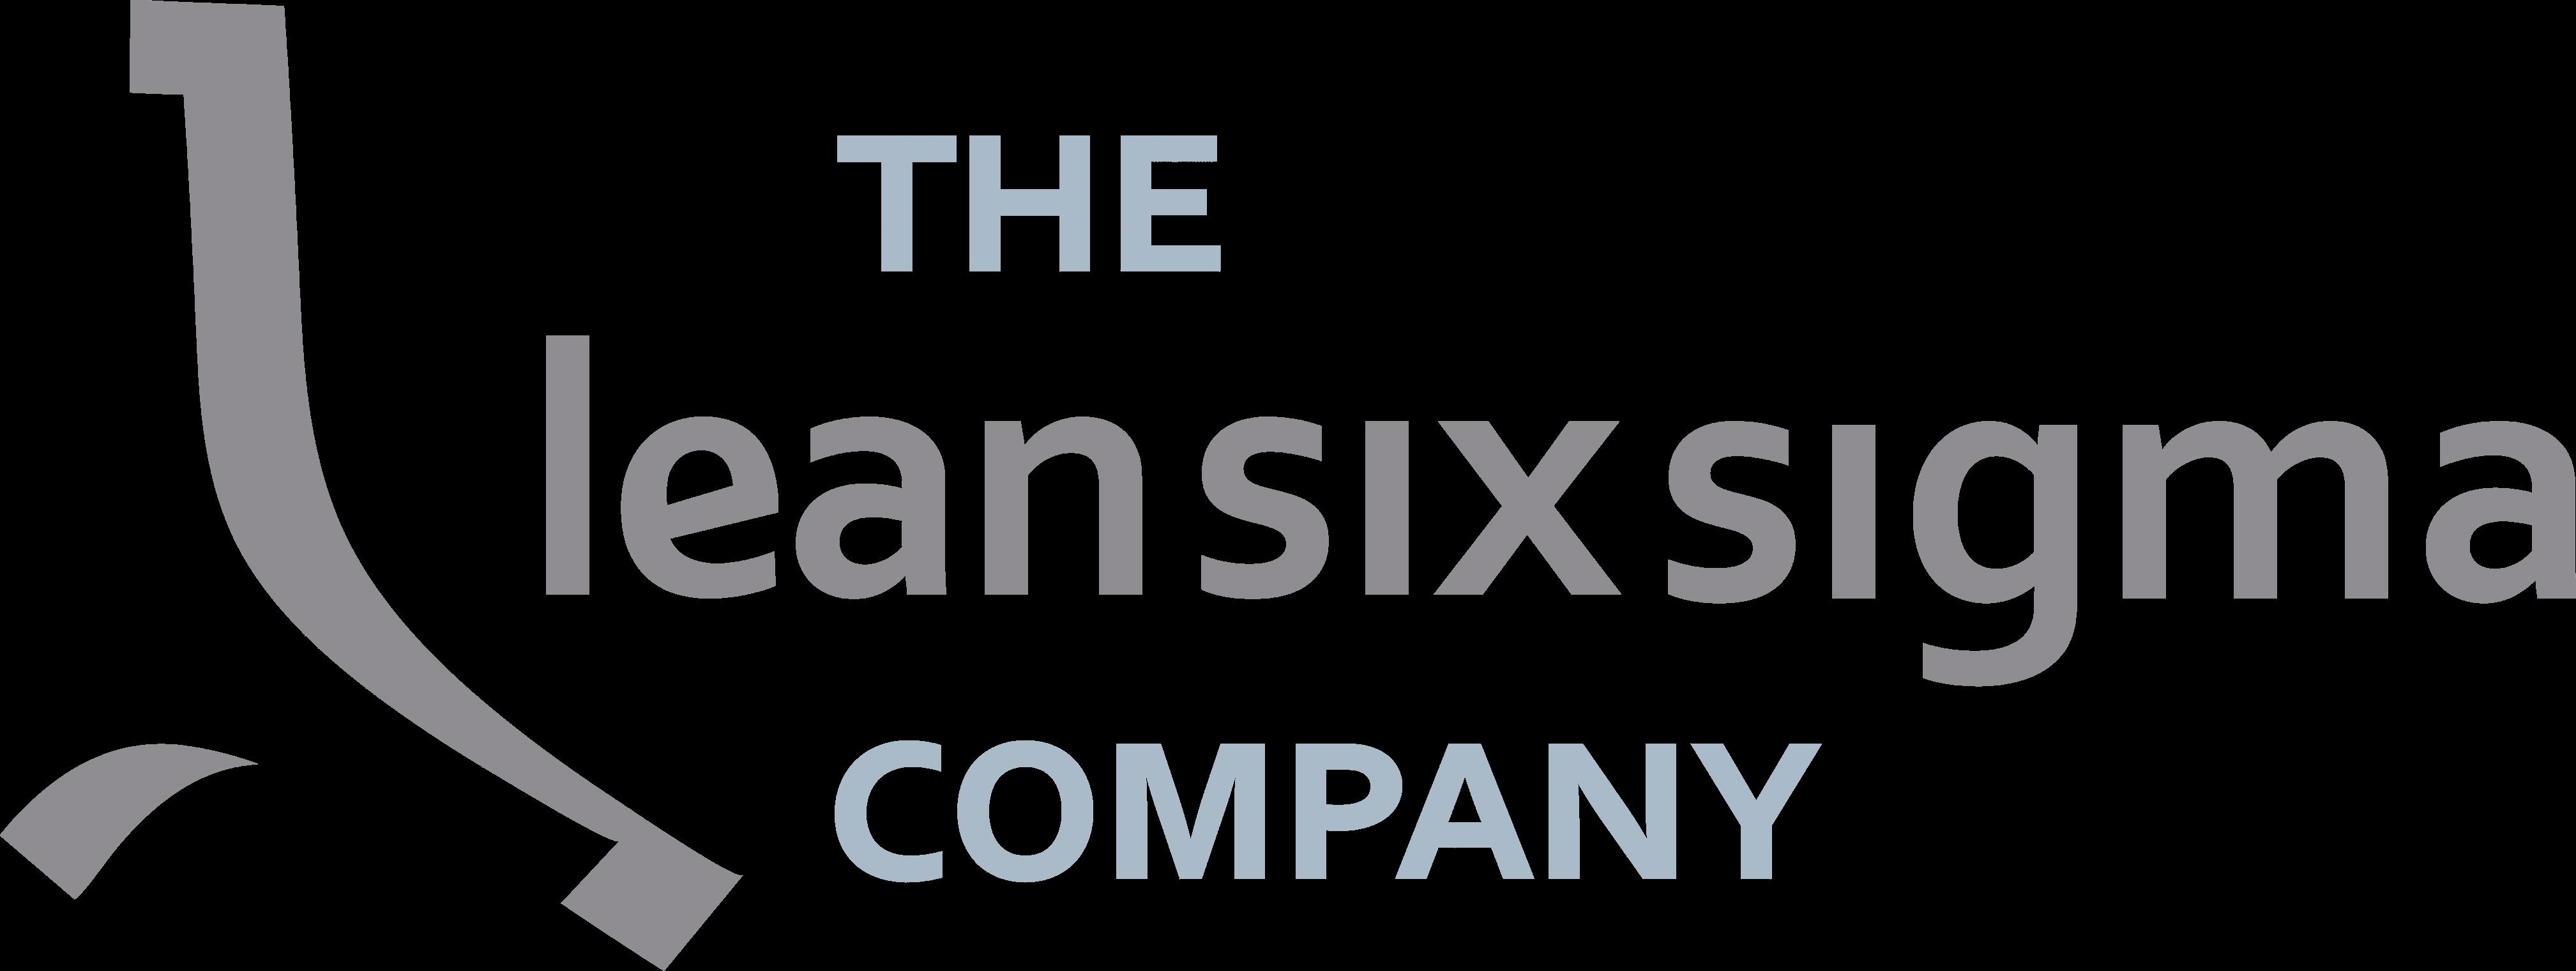 The Lean Six Sigma Company España